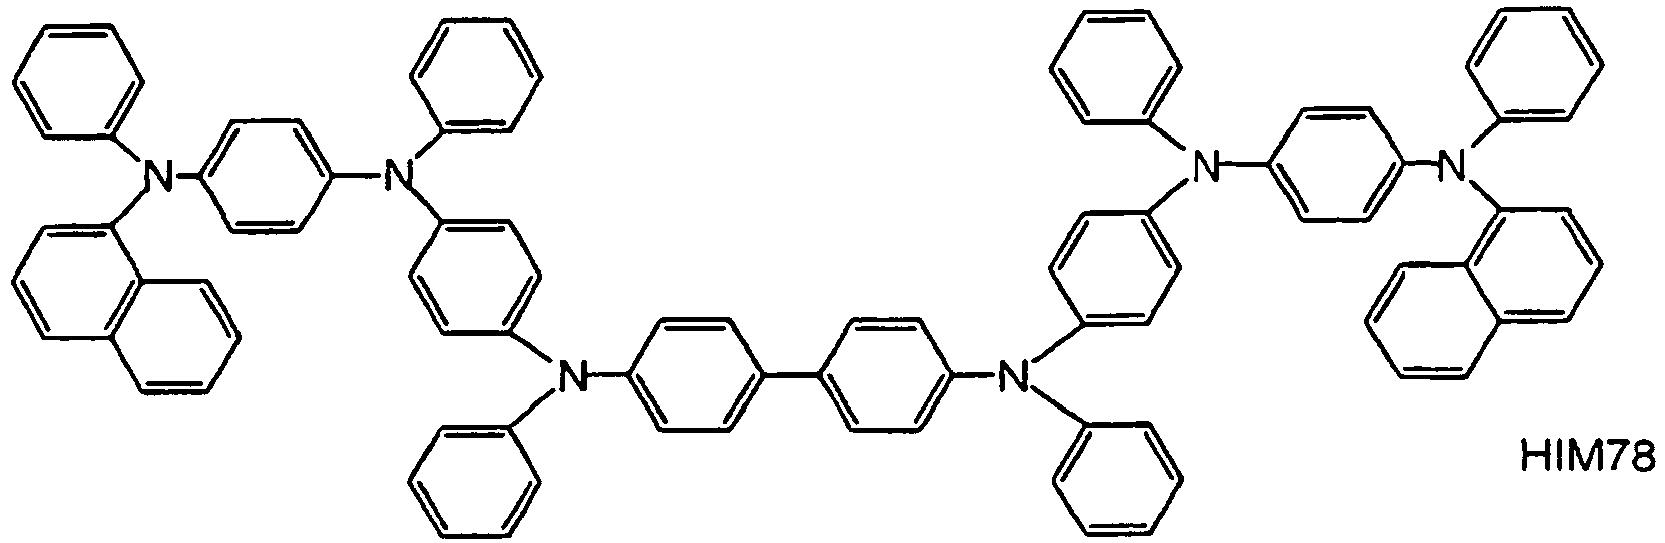 Figure imgb0947